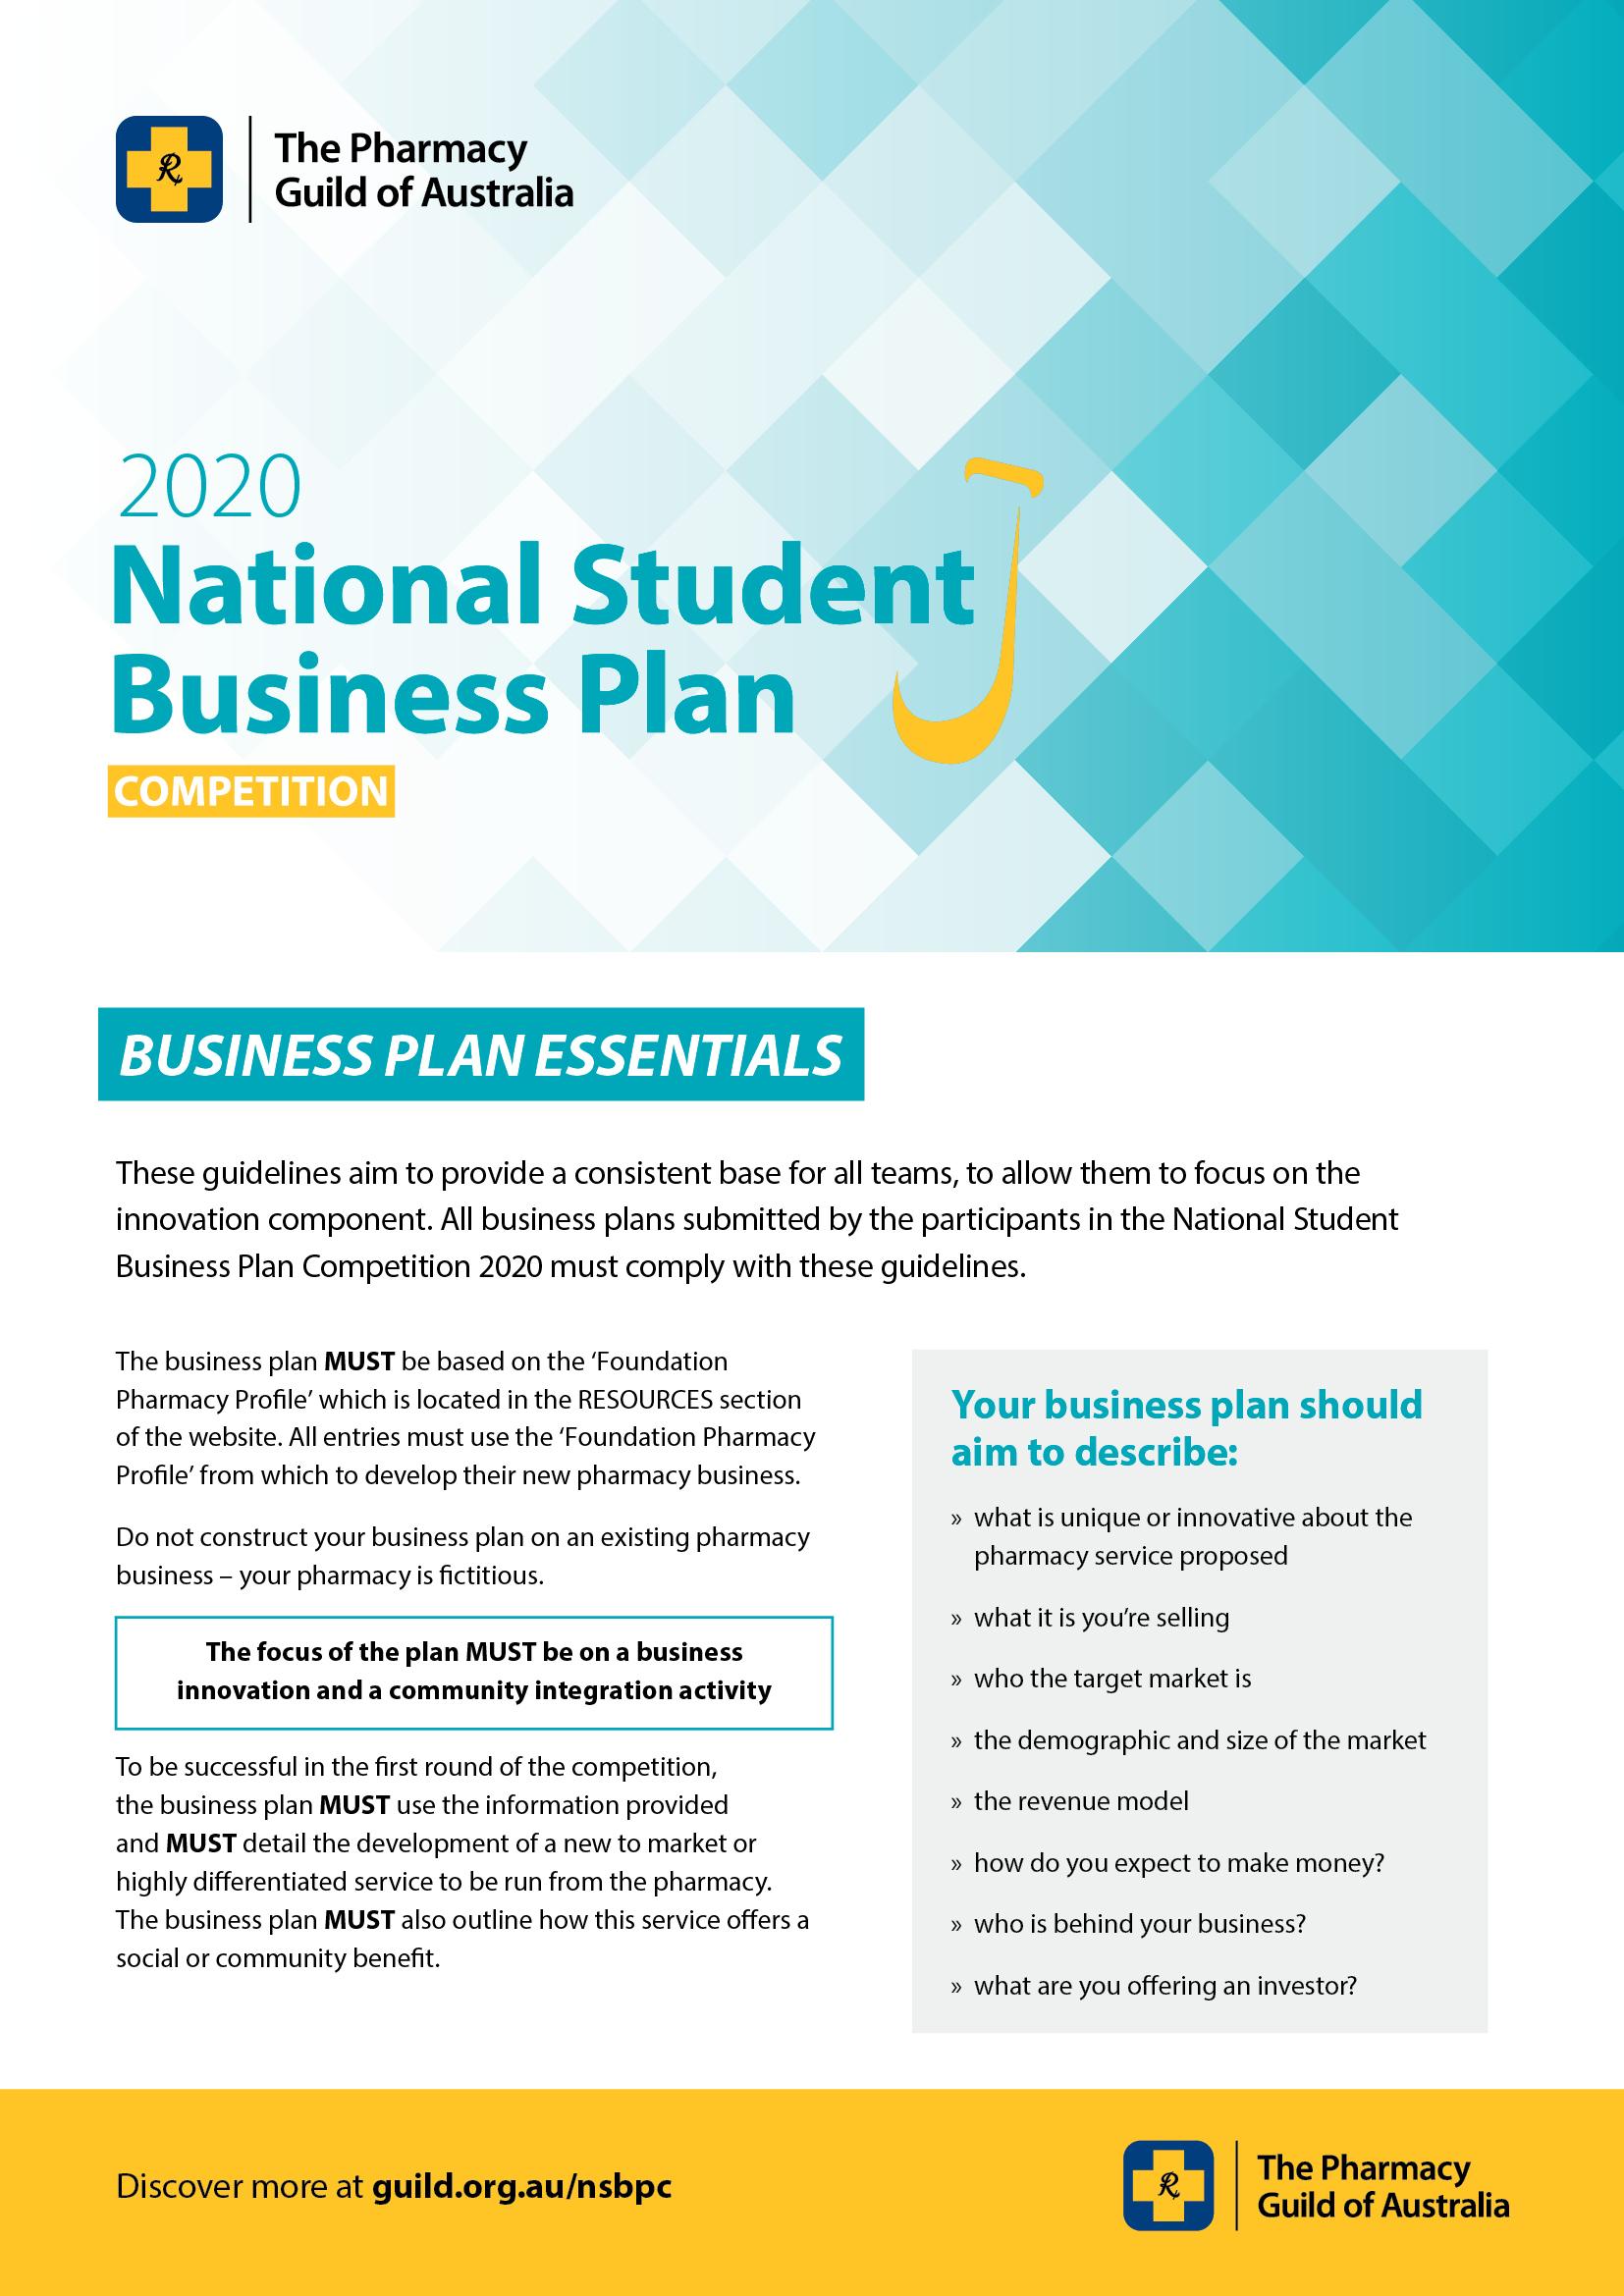 NSBPC2020 Business Plan Checklist image